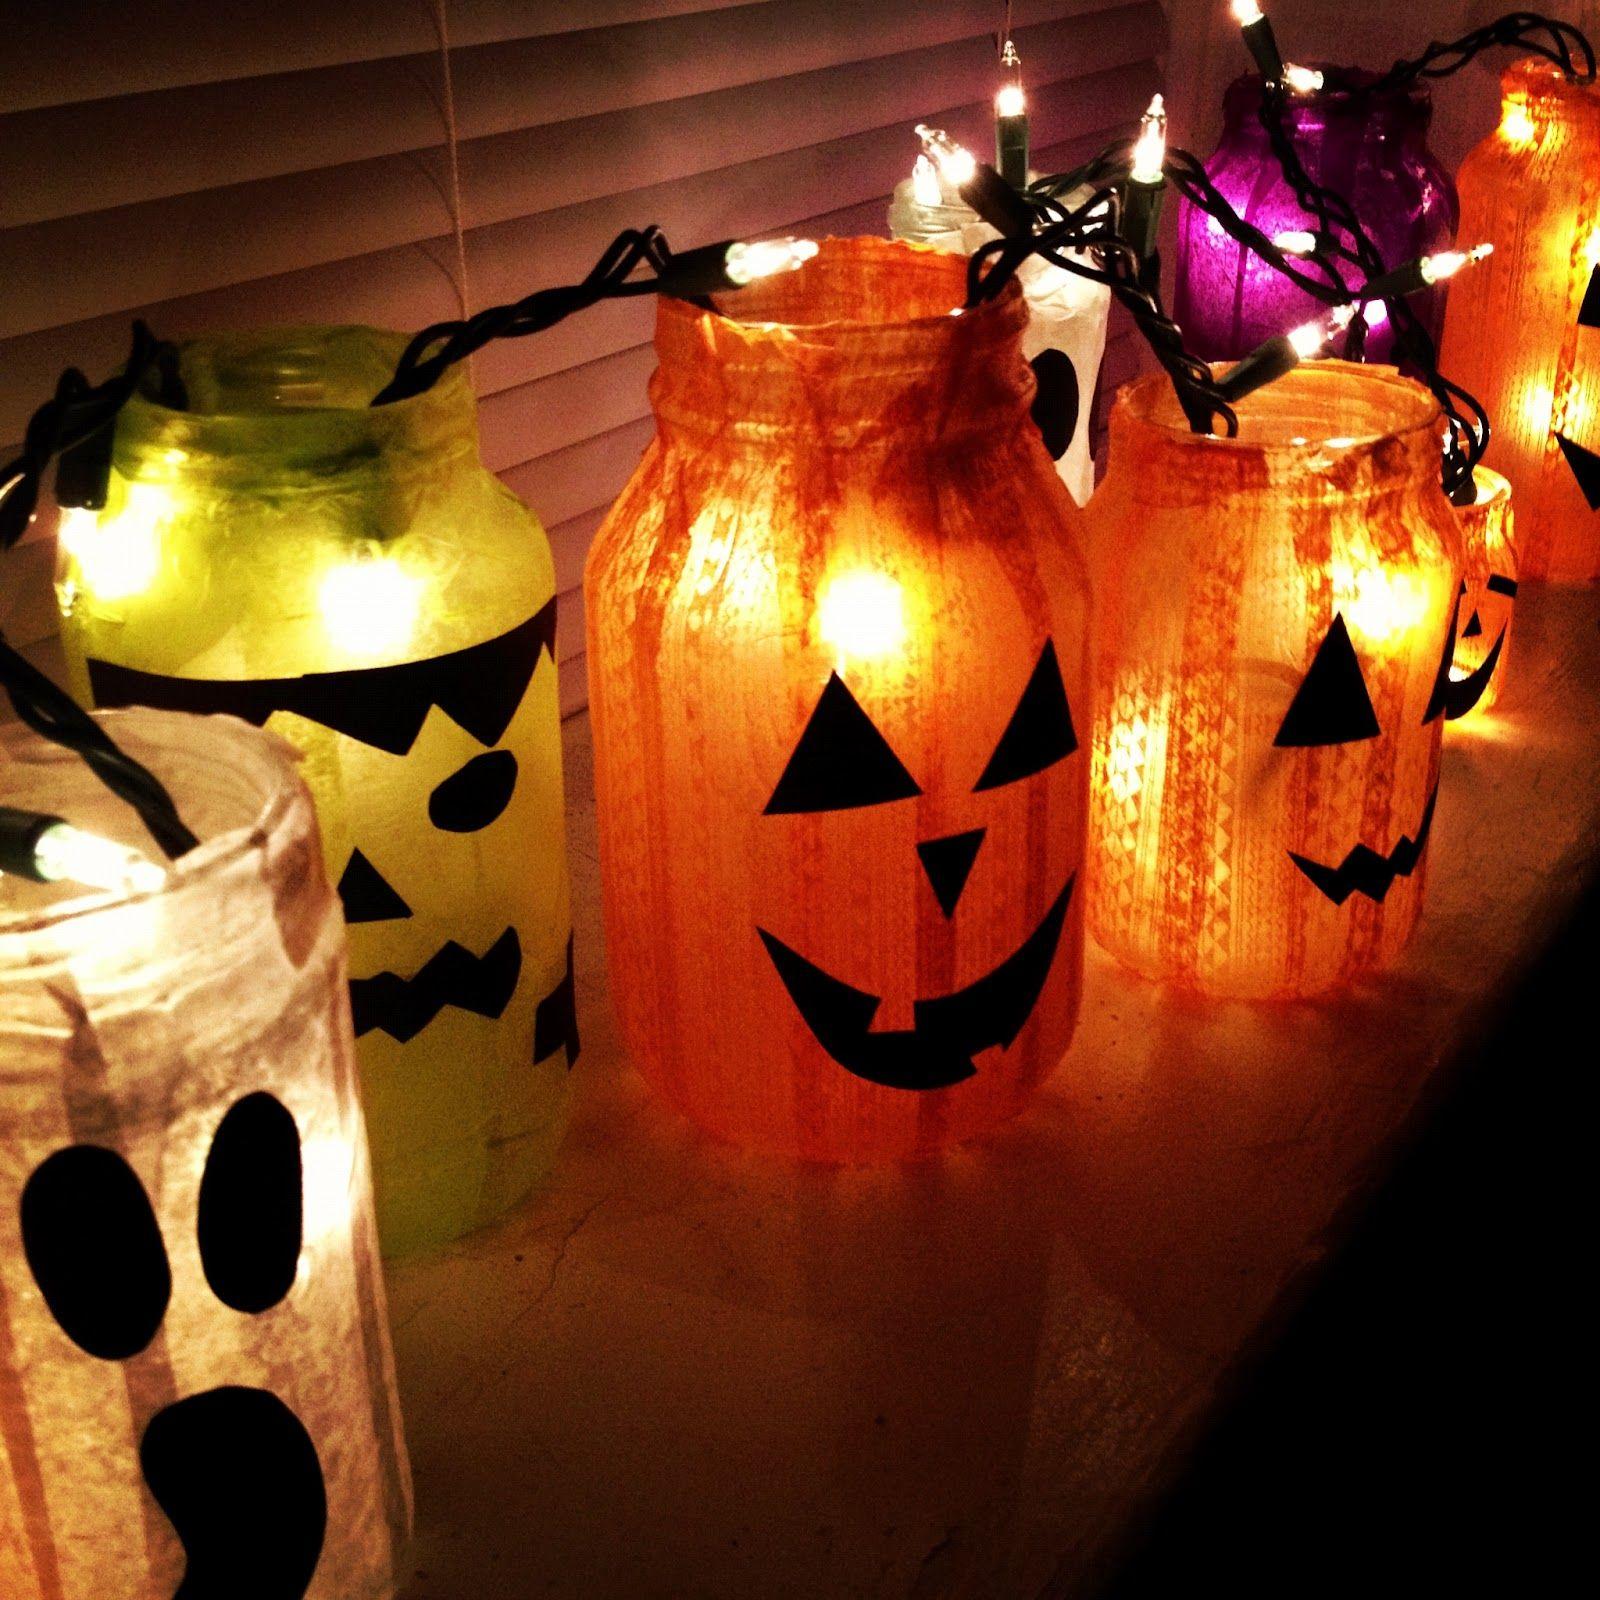 Crafty Lumberjacks Simple Halloween Jars Jars, Tissue Paper, Glue (Or